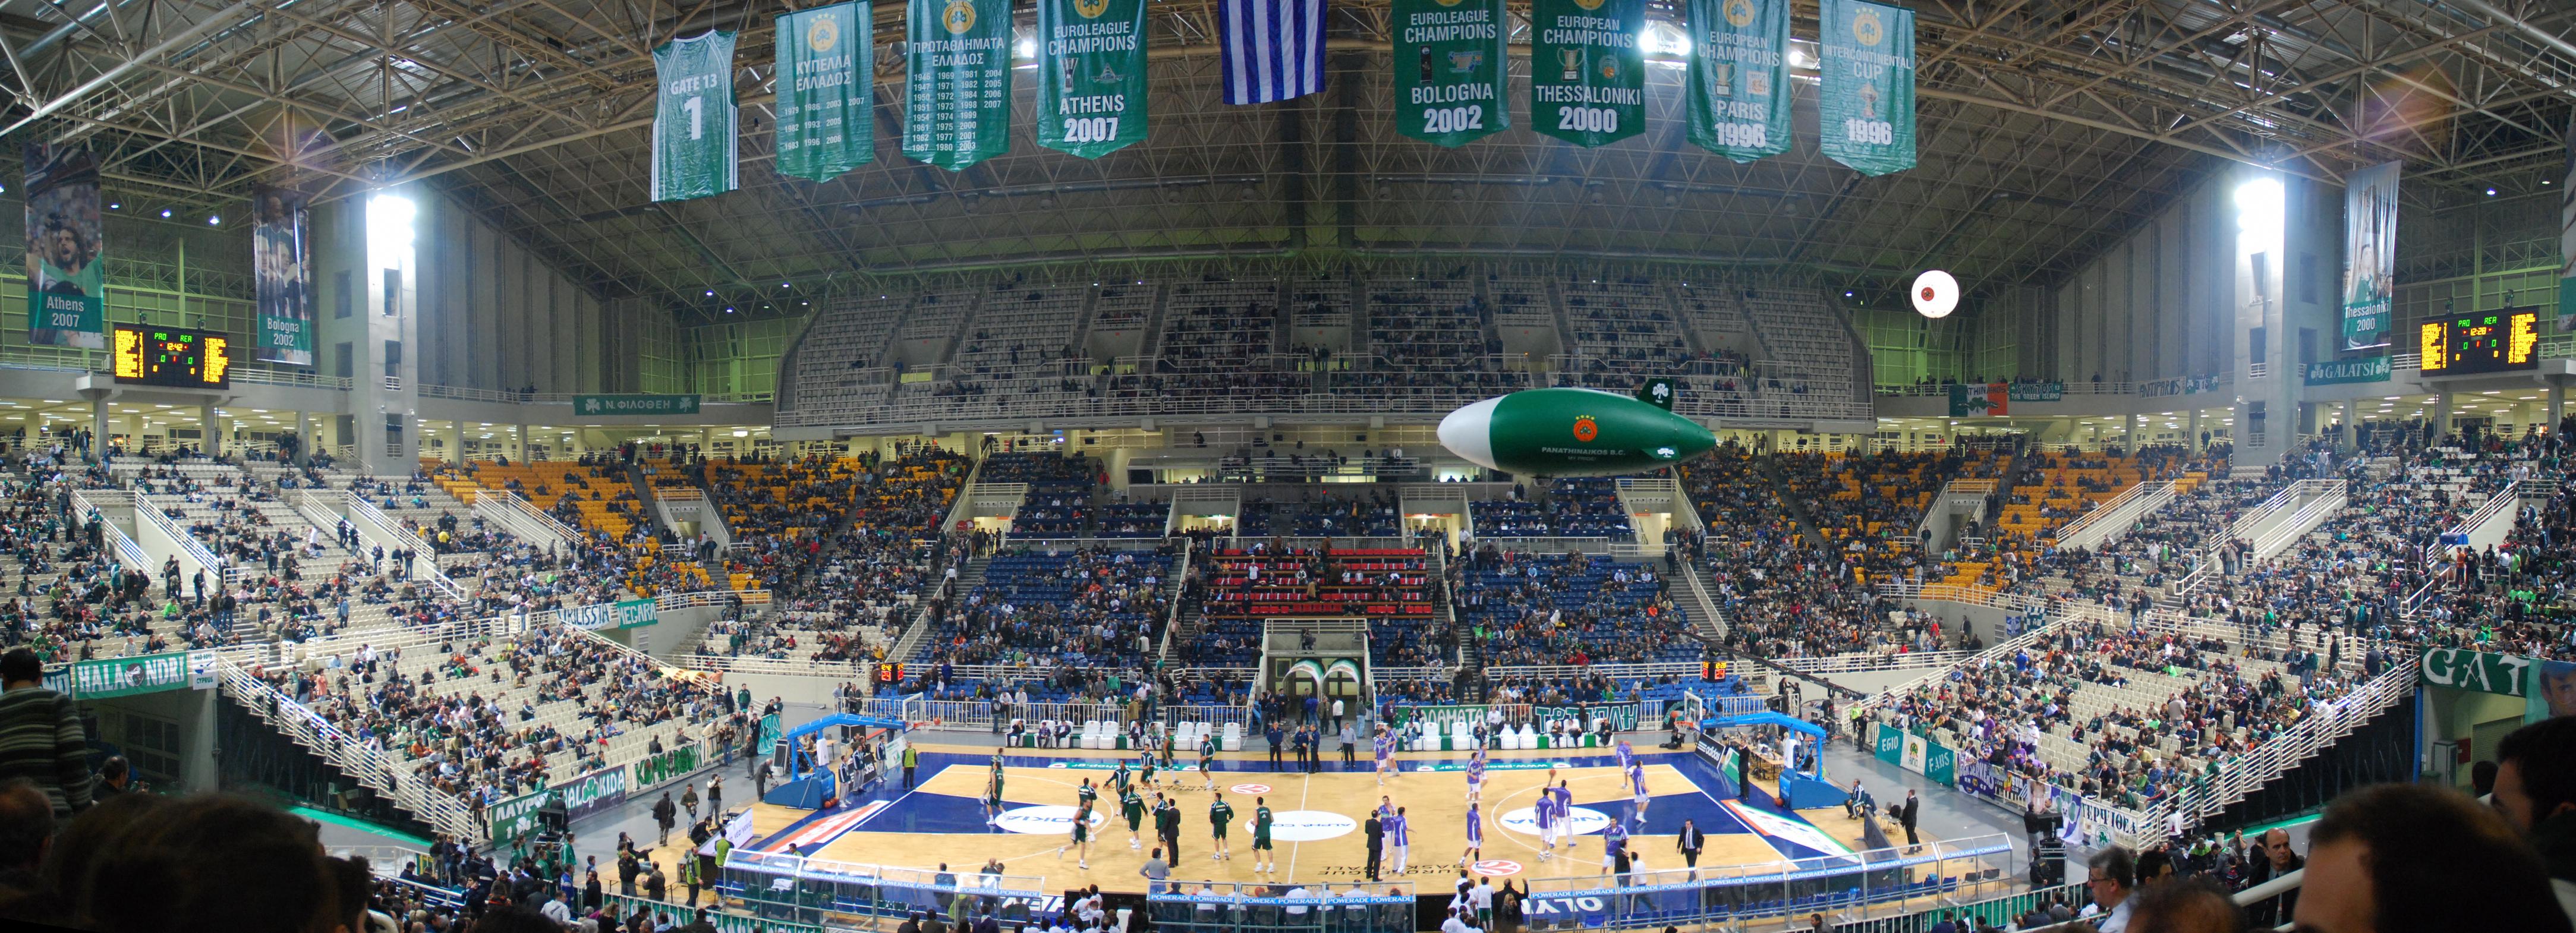 File:Interior of OAKA Olympic Indoor Hall, Athens.jpg ...